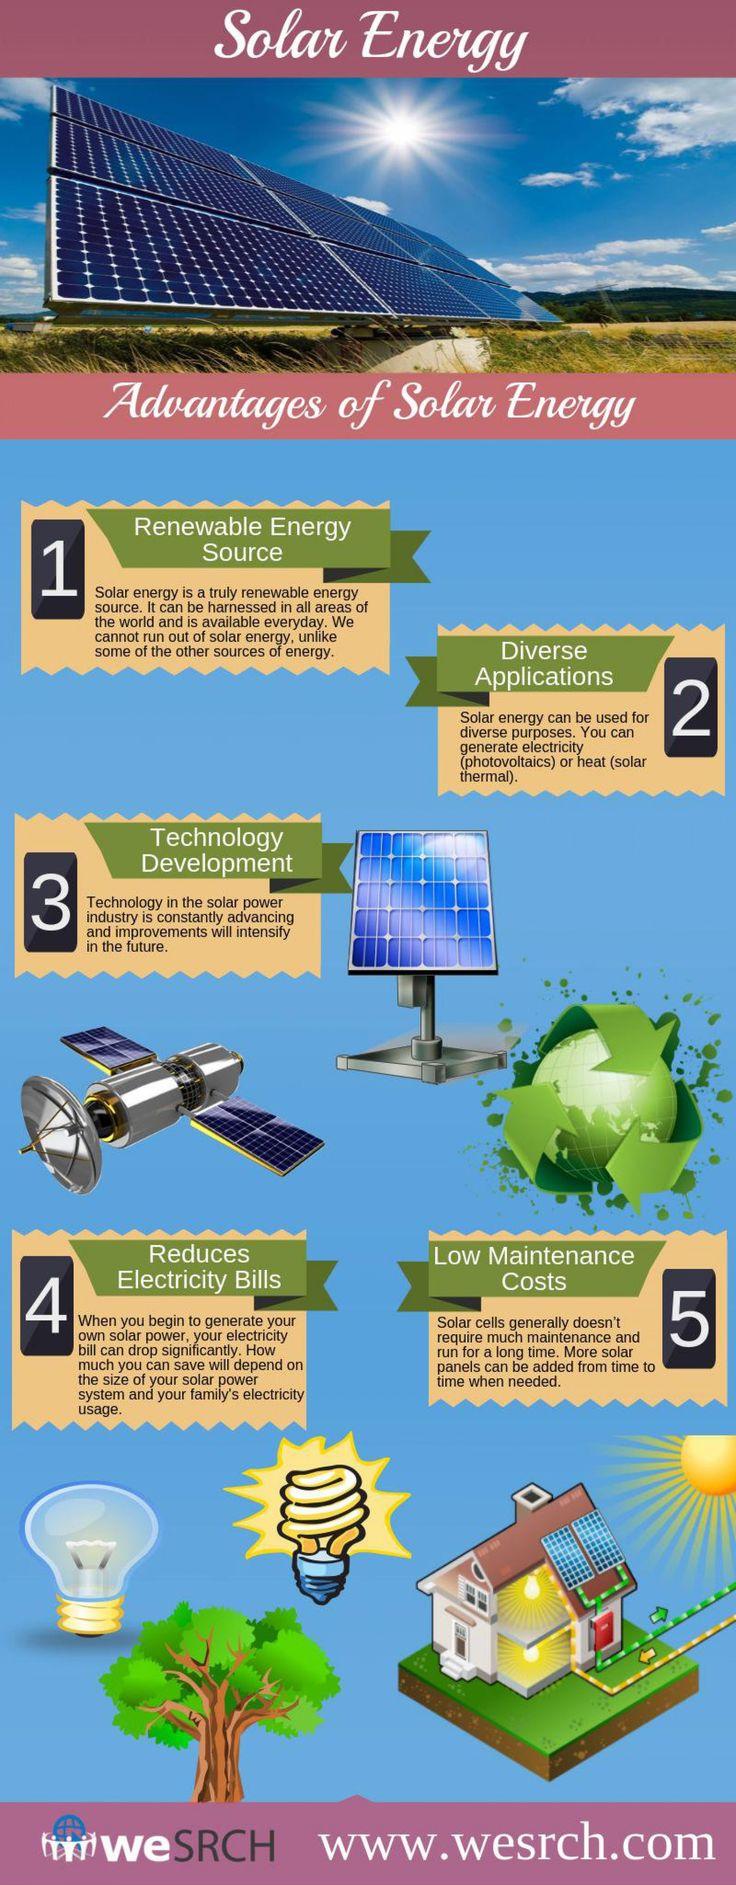 Top 5 Advantages of Solar Energy  #SolarEnergy #RenewableEnergySource #EnergyResources #RenewableEnergy